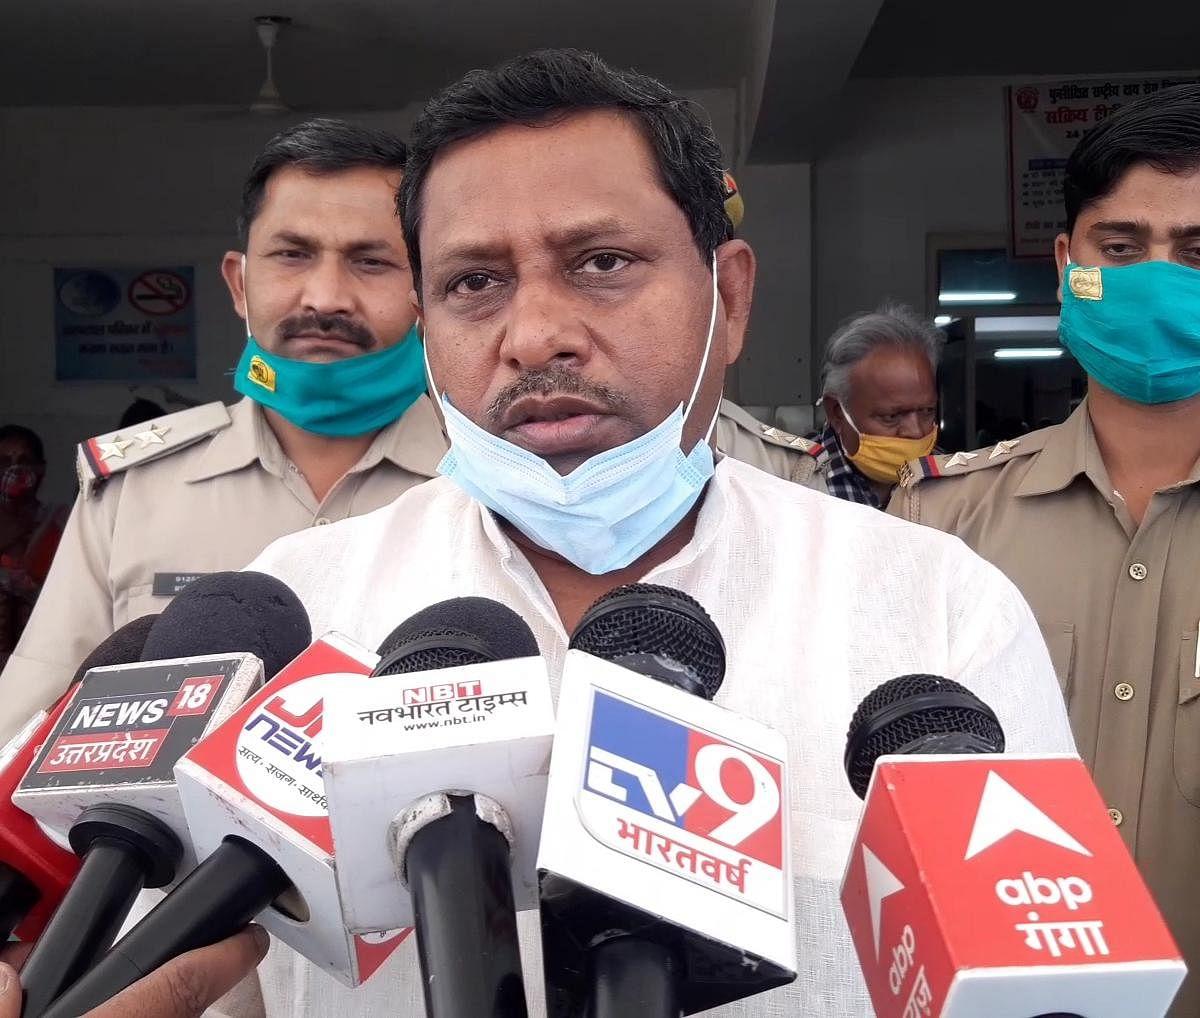 सपा को हराकर बीजेपी के प्रत्याशी जीतेंगे पंचायत चुनाव : रामशंकर